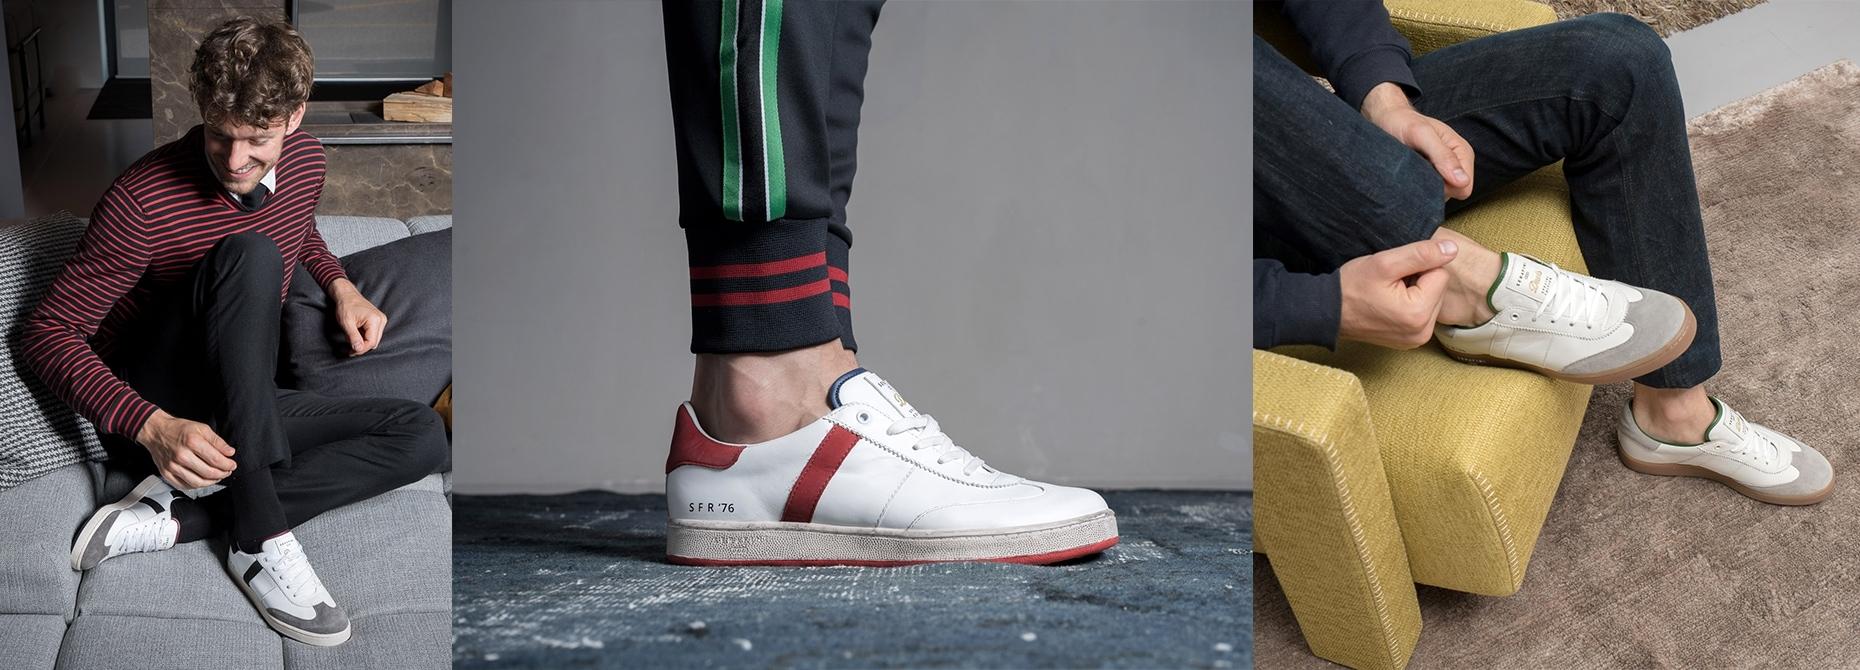 Luxury Sneakers Davis Online Serafini Shop n6twfqnx8v